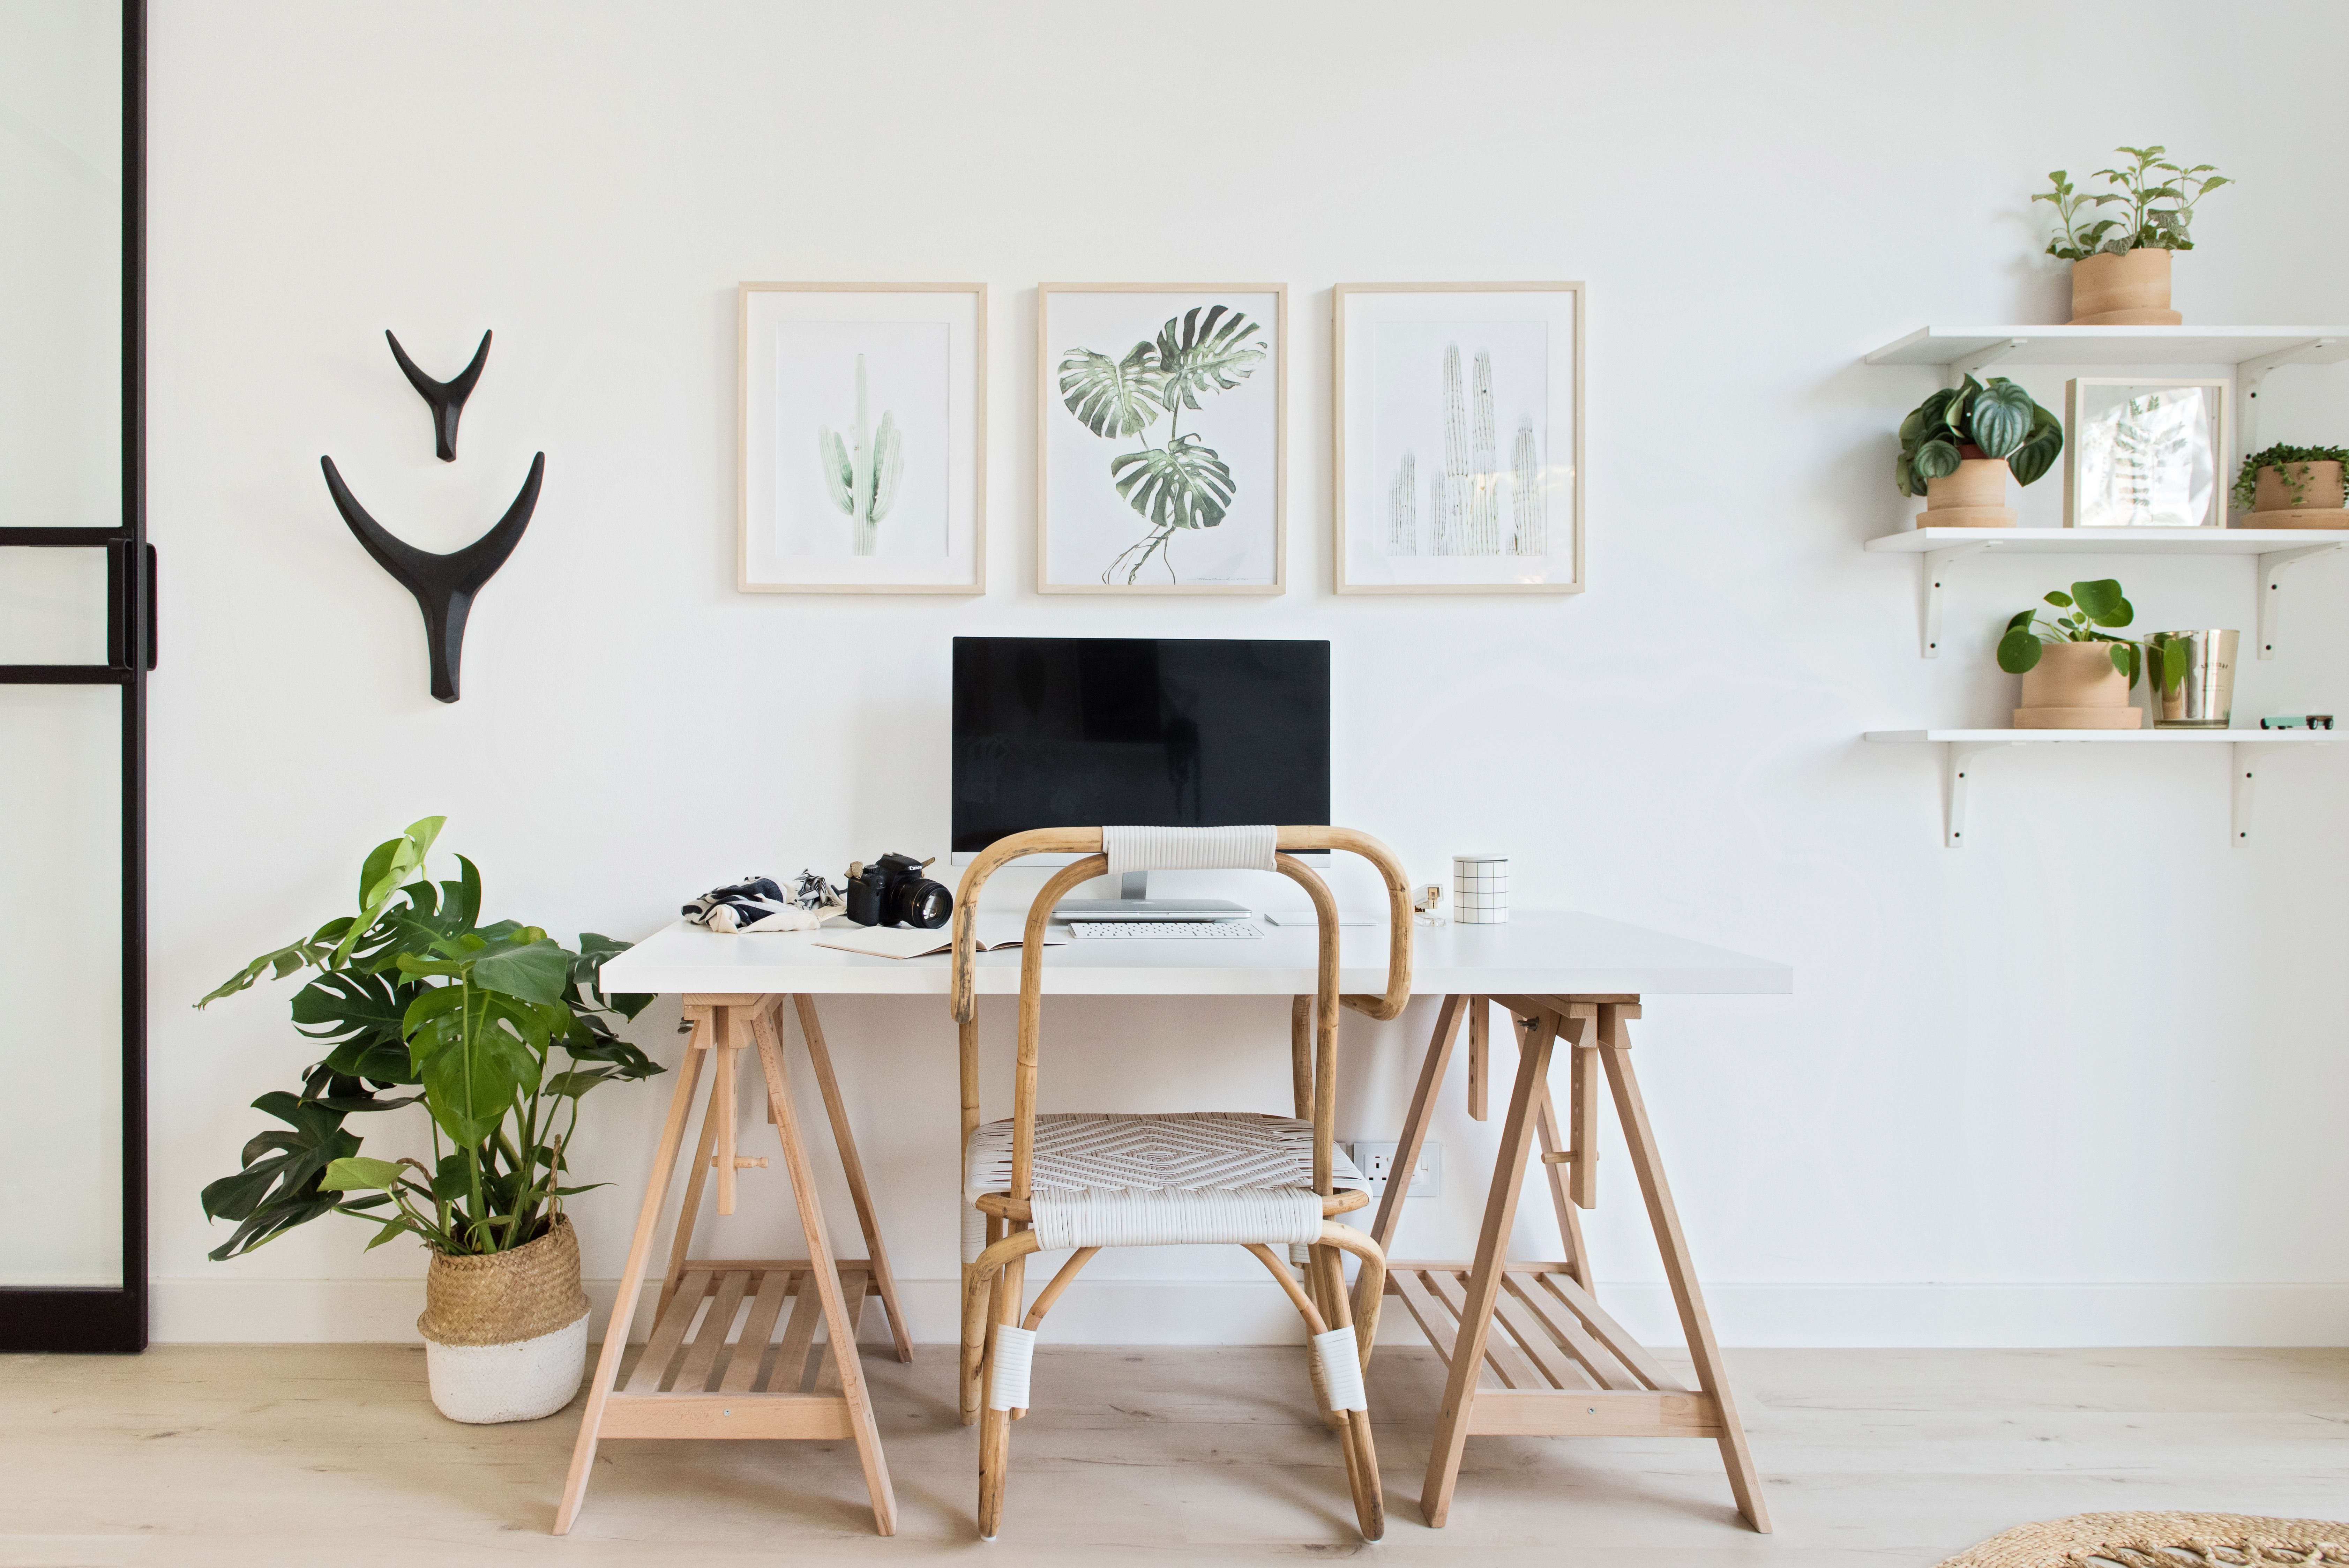 Scandi Boho Desk Simple Office Design Scandinavian Design Officegoals Workspacegoals Deskgoals Homeoffice Work Office Decor Home Office Design Home Decor